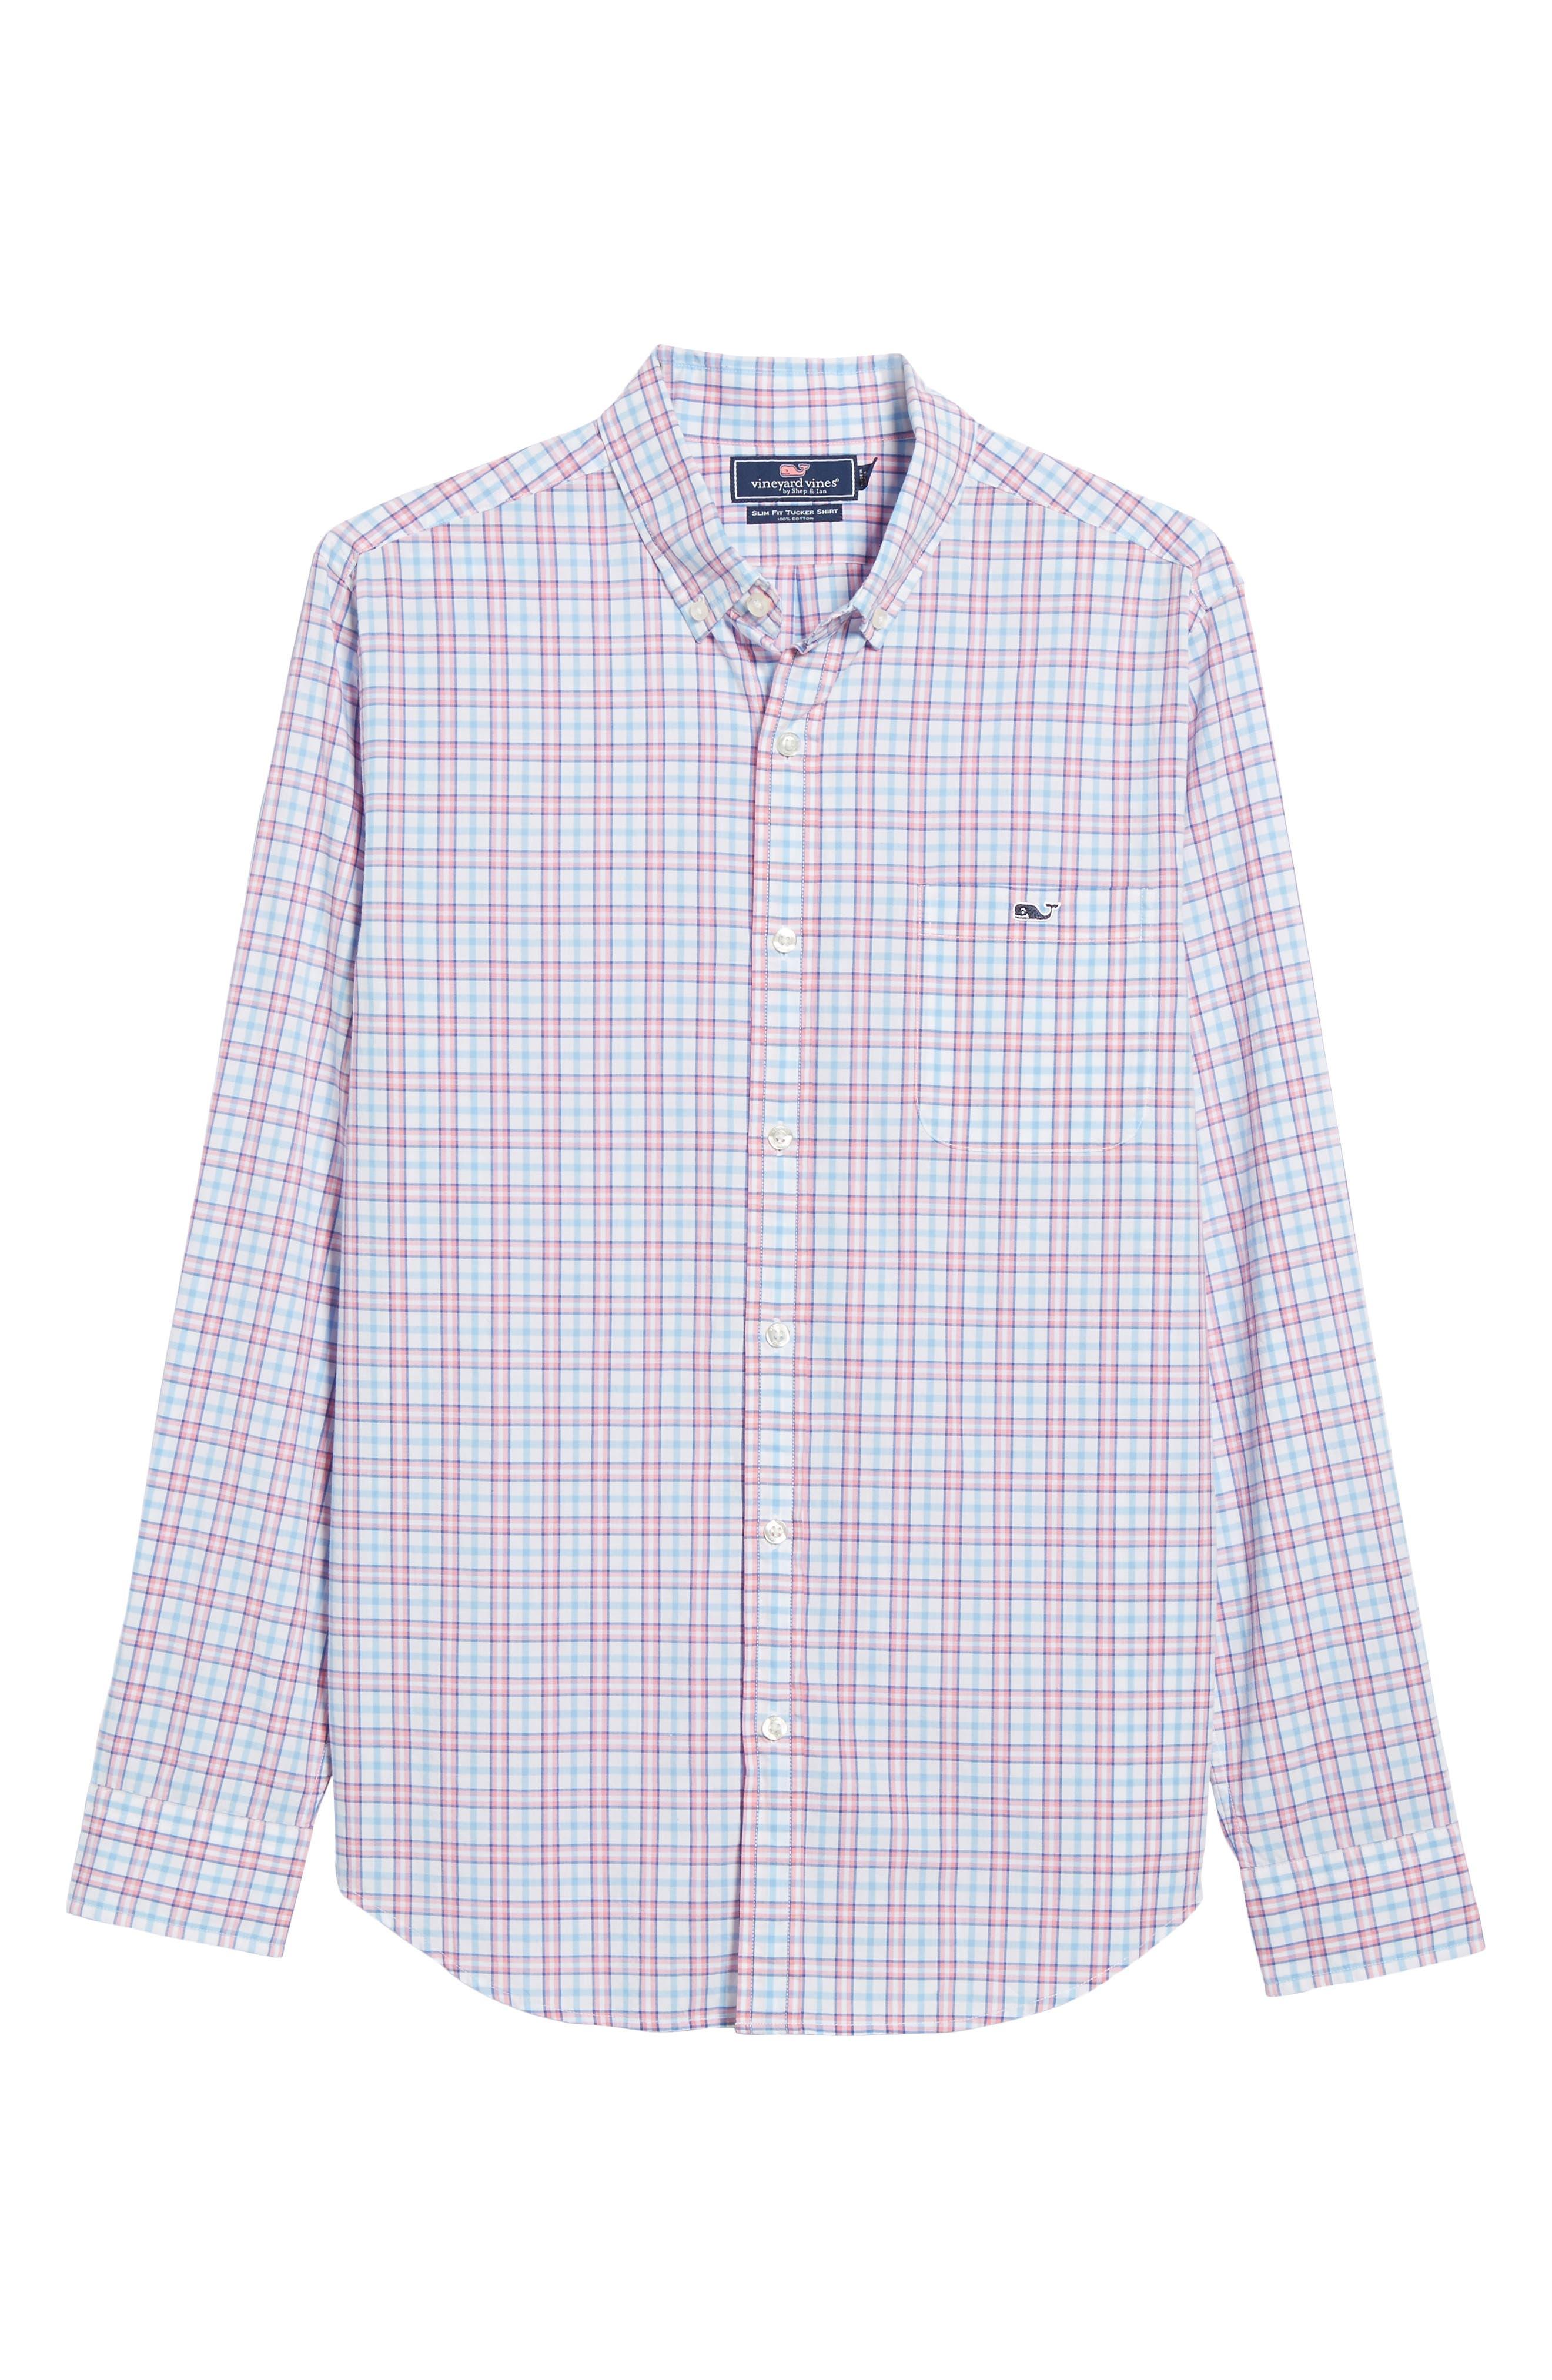 Kennard Tucker Slim Fit Plaid Sport Shirt,                             Alternate thumbnail 6, color,                             956